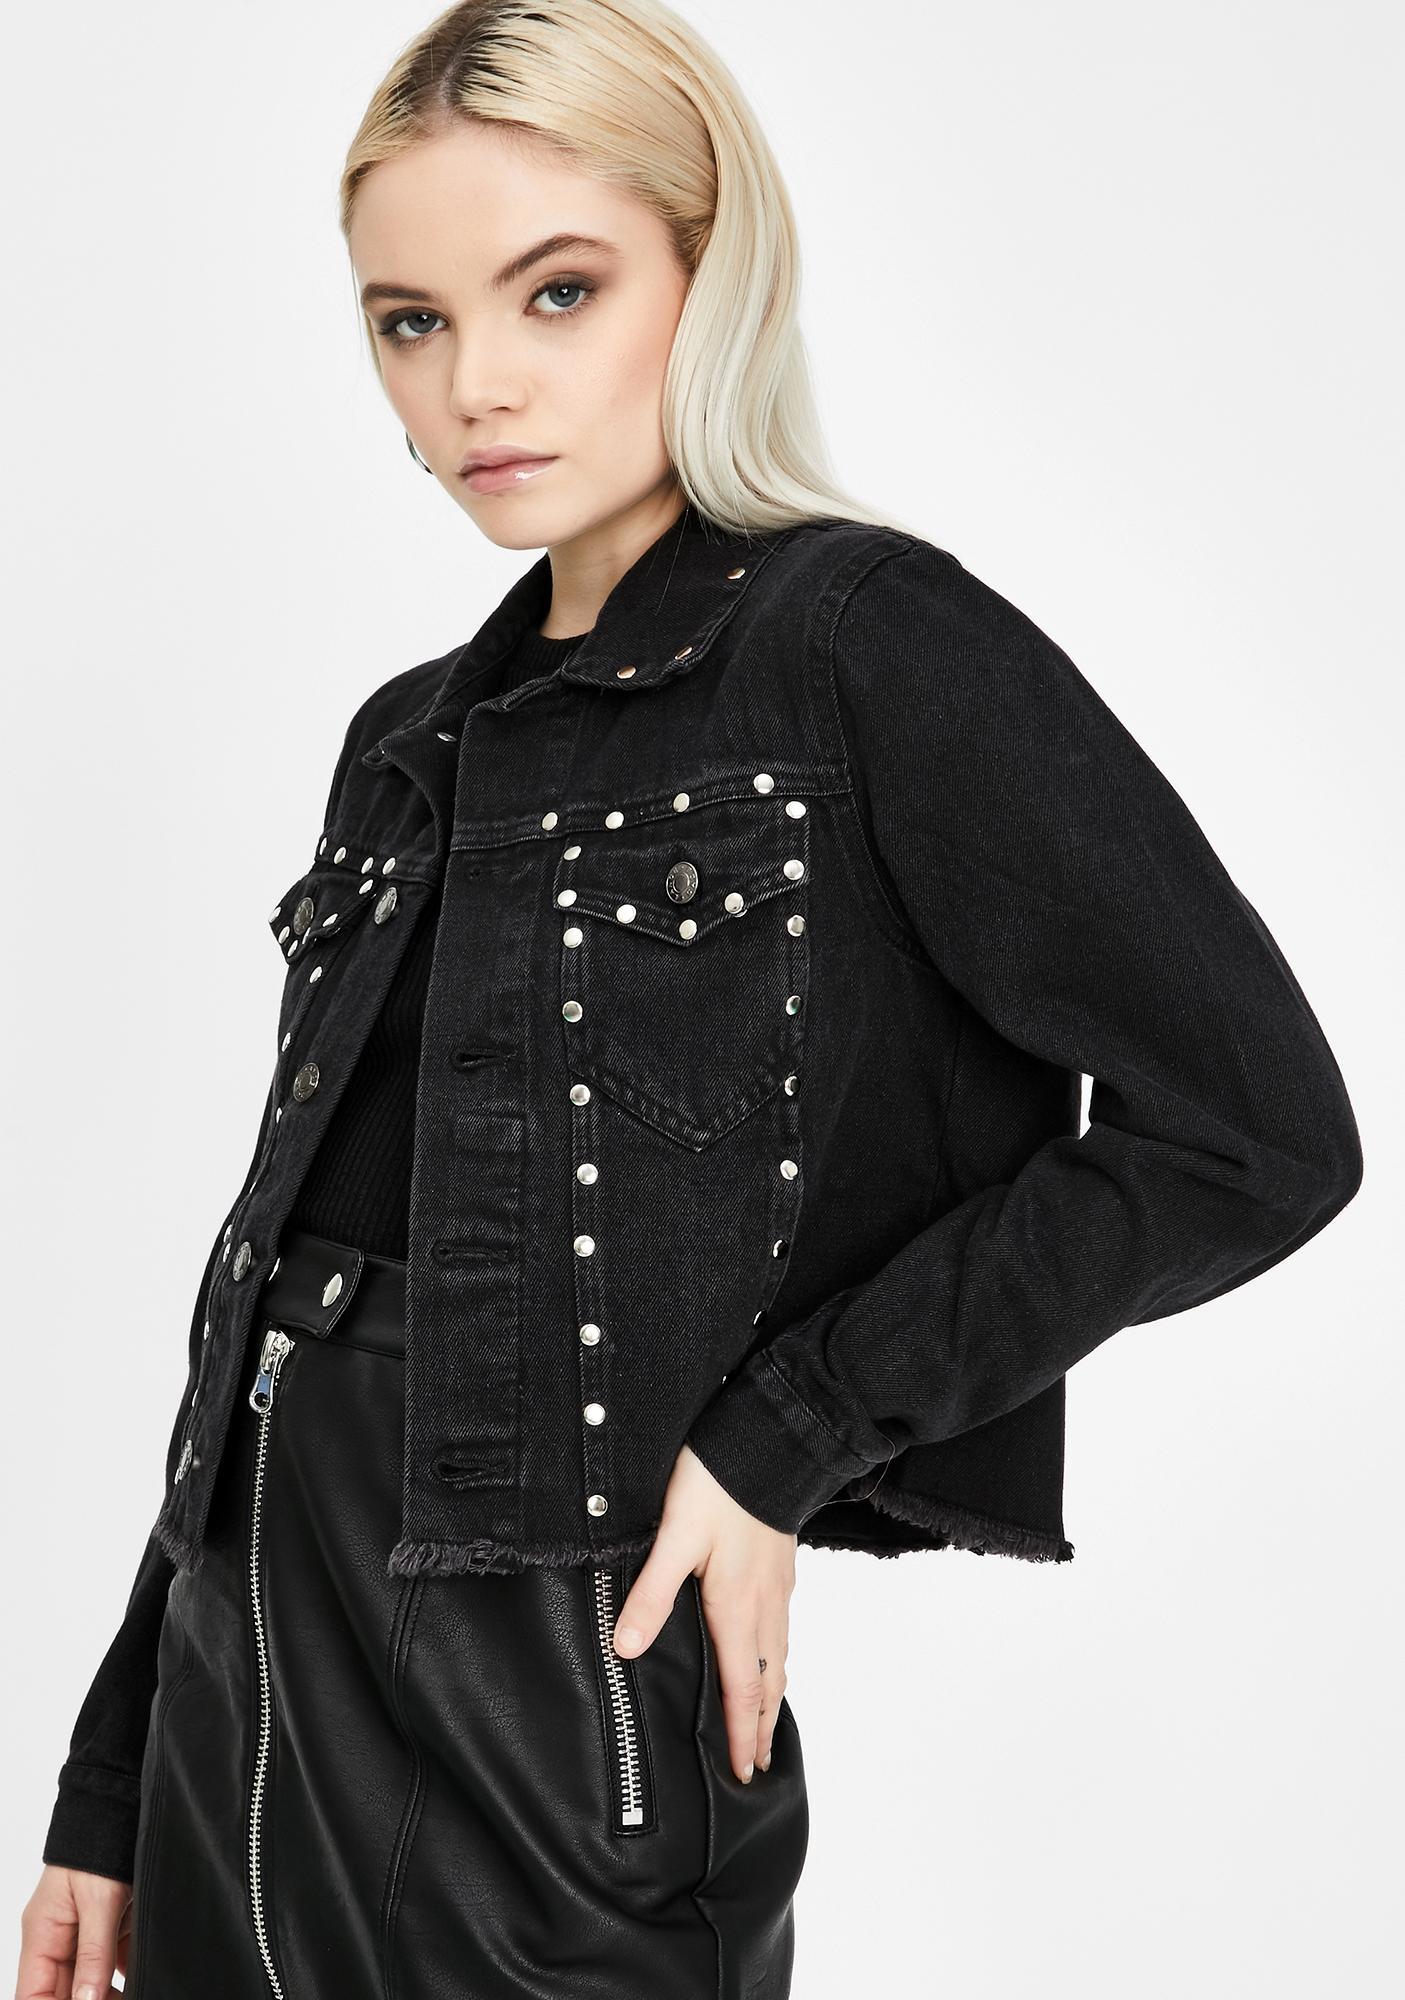 ZEMETA Studded Black Denim Jacket